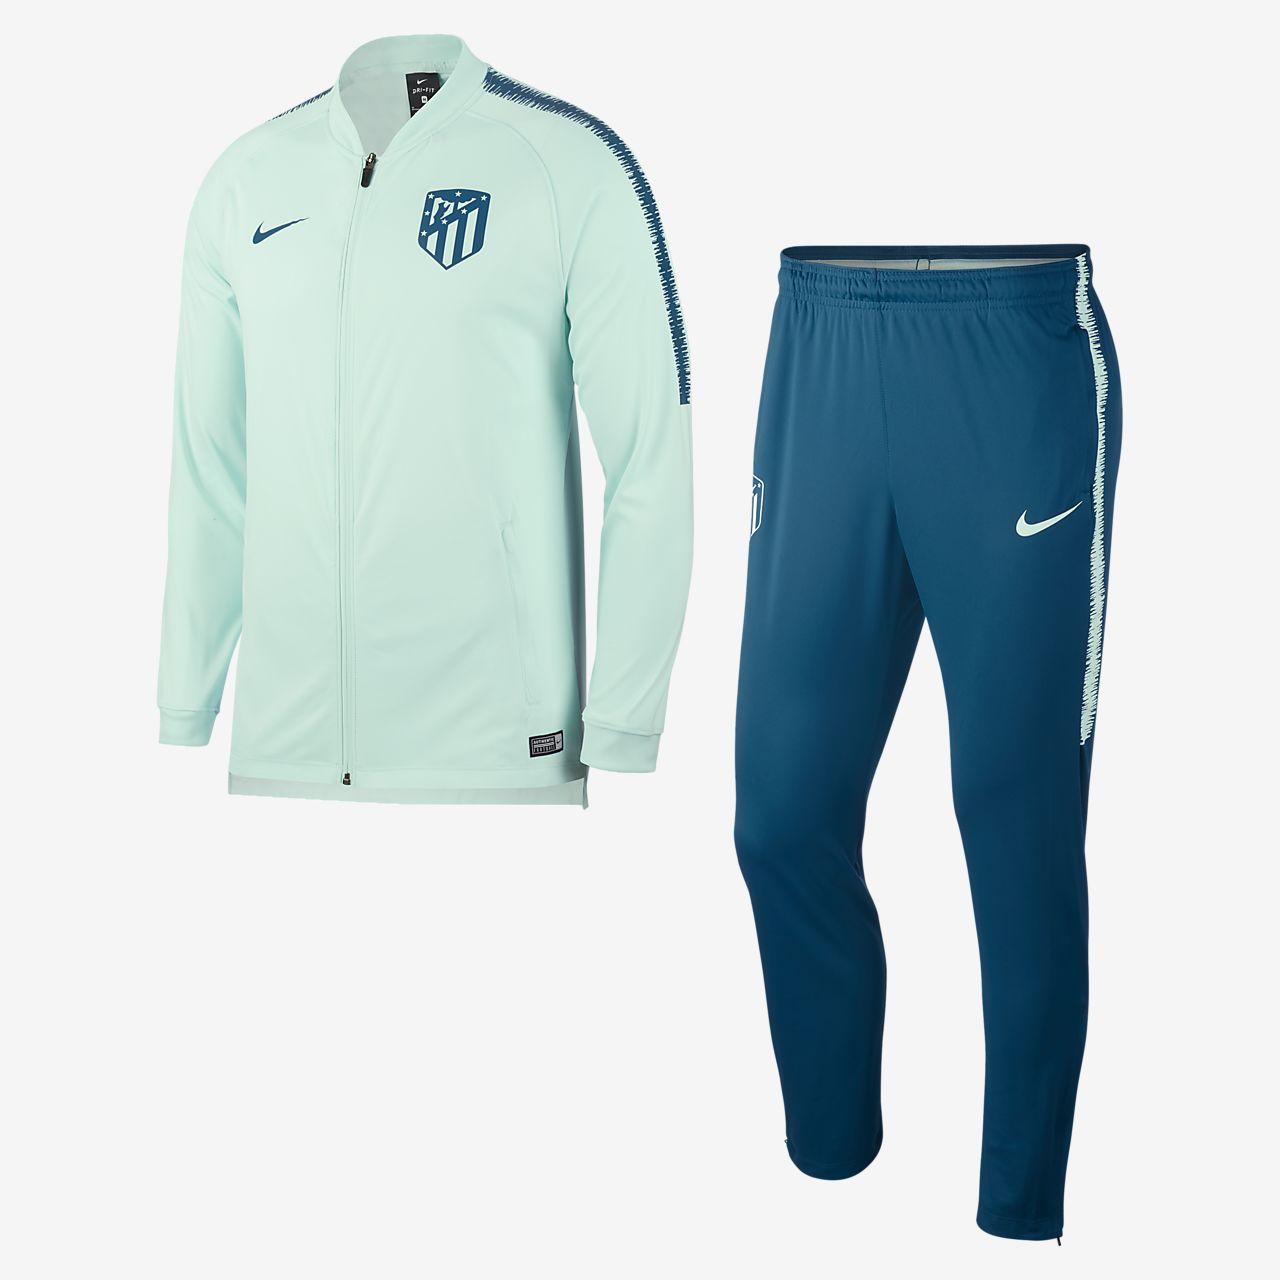 abbigliamento calcio Atlético de Madrid ufficiale